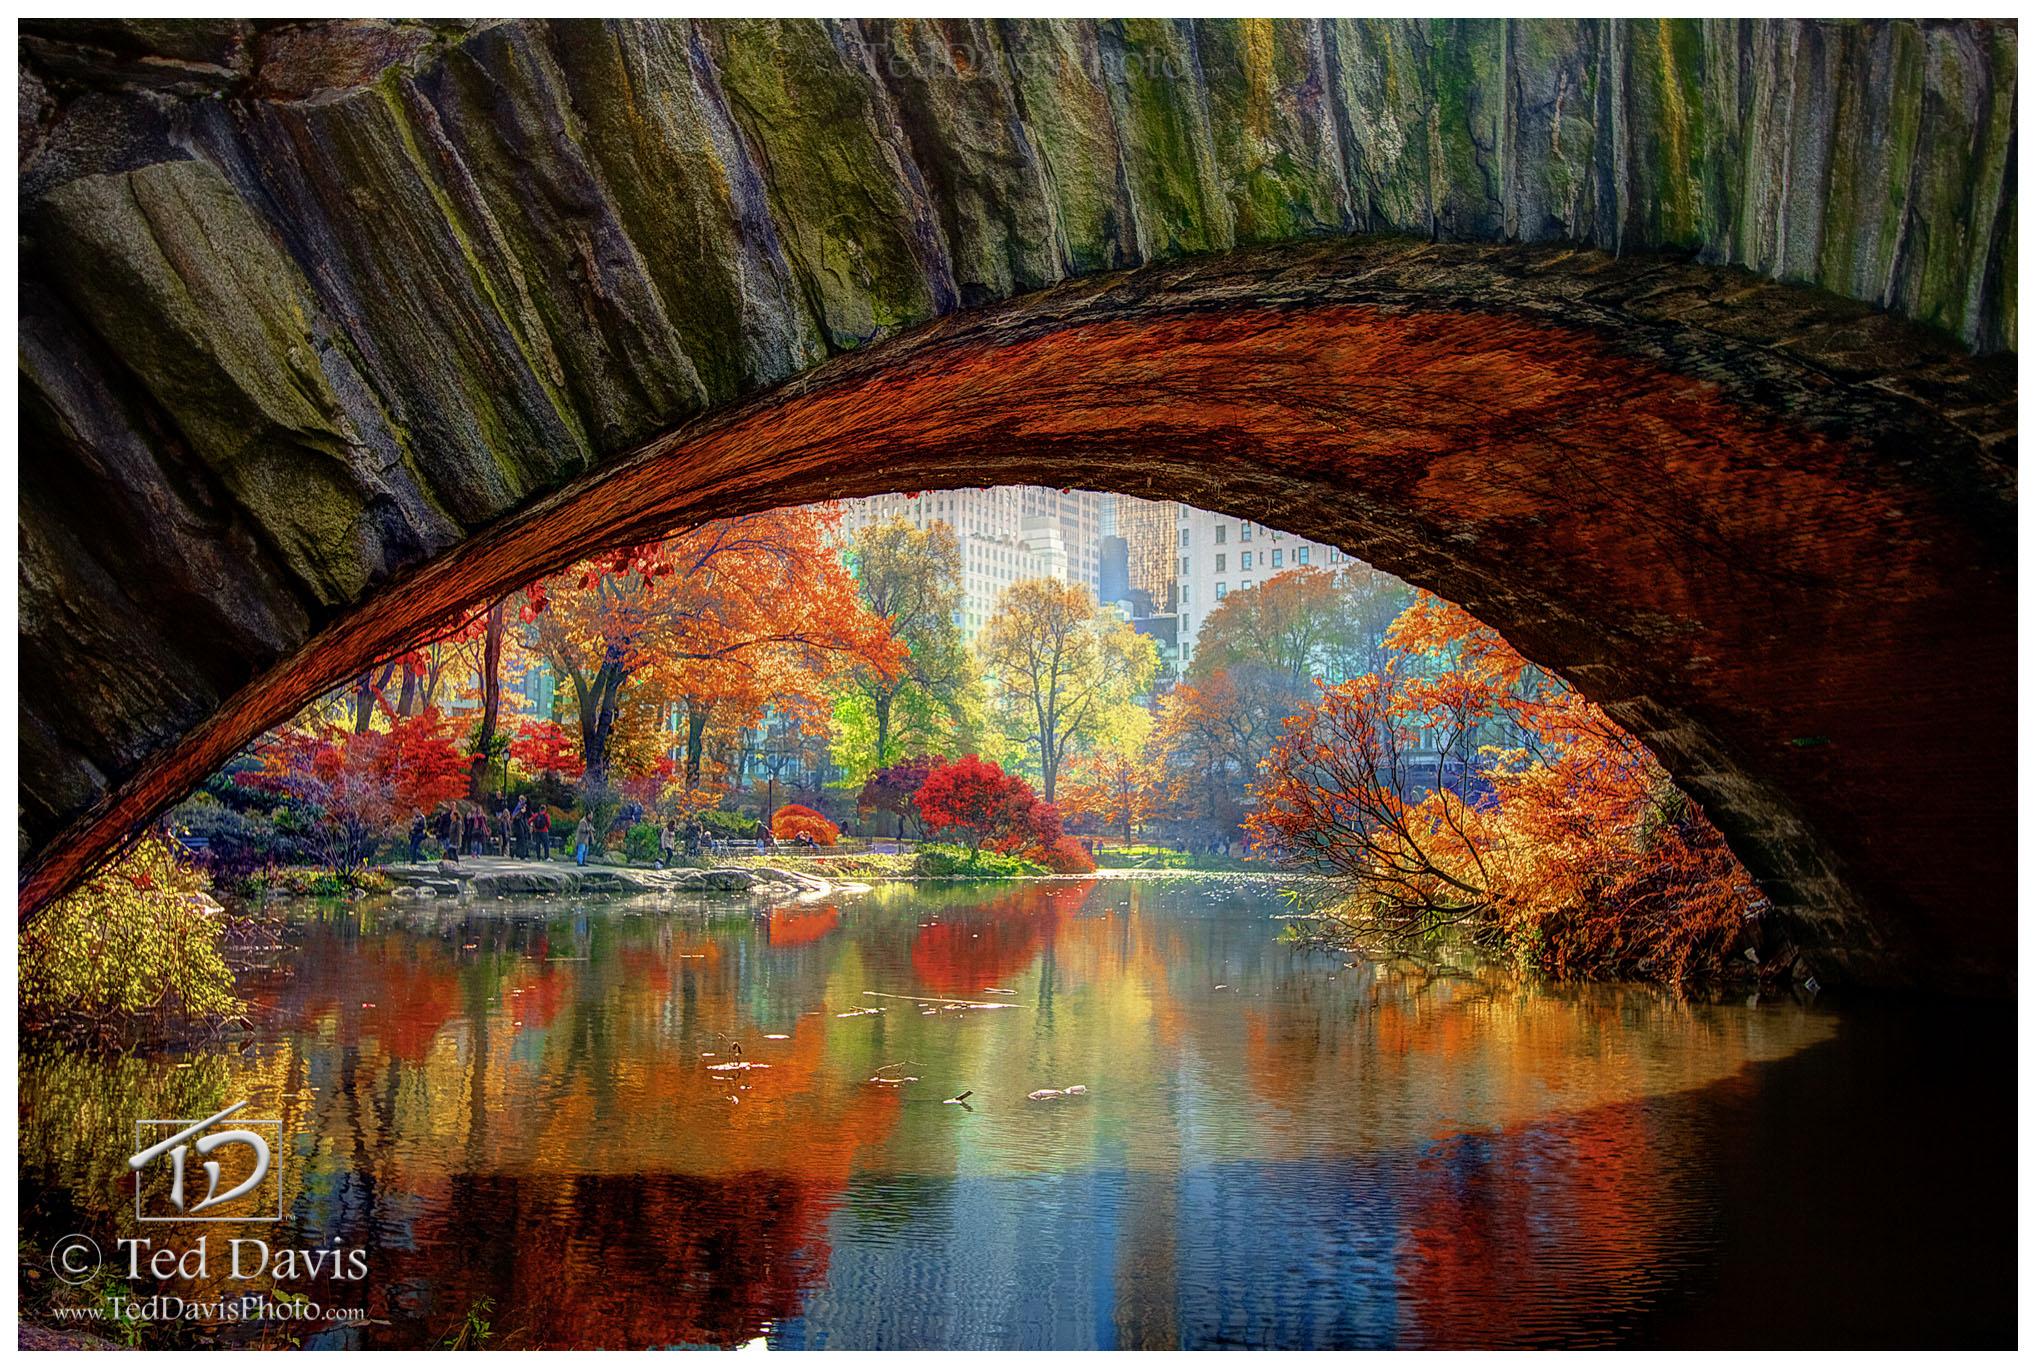 central park, Manhattan, new york, color, fall, bridge